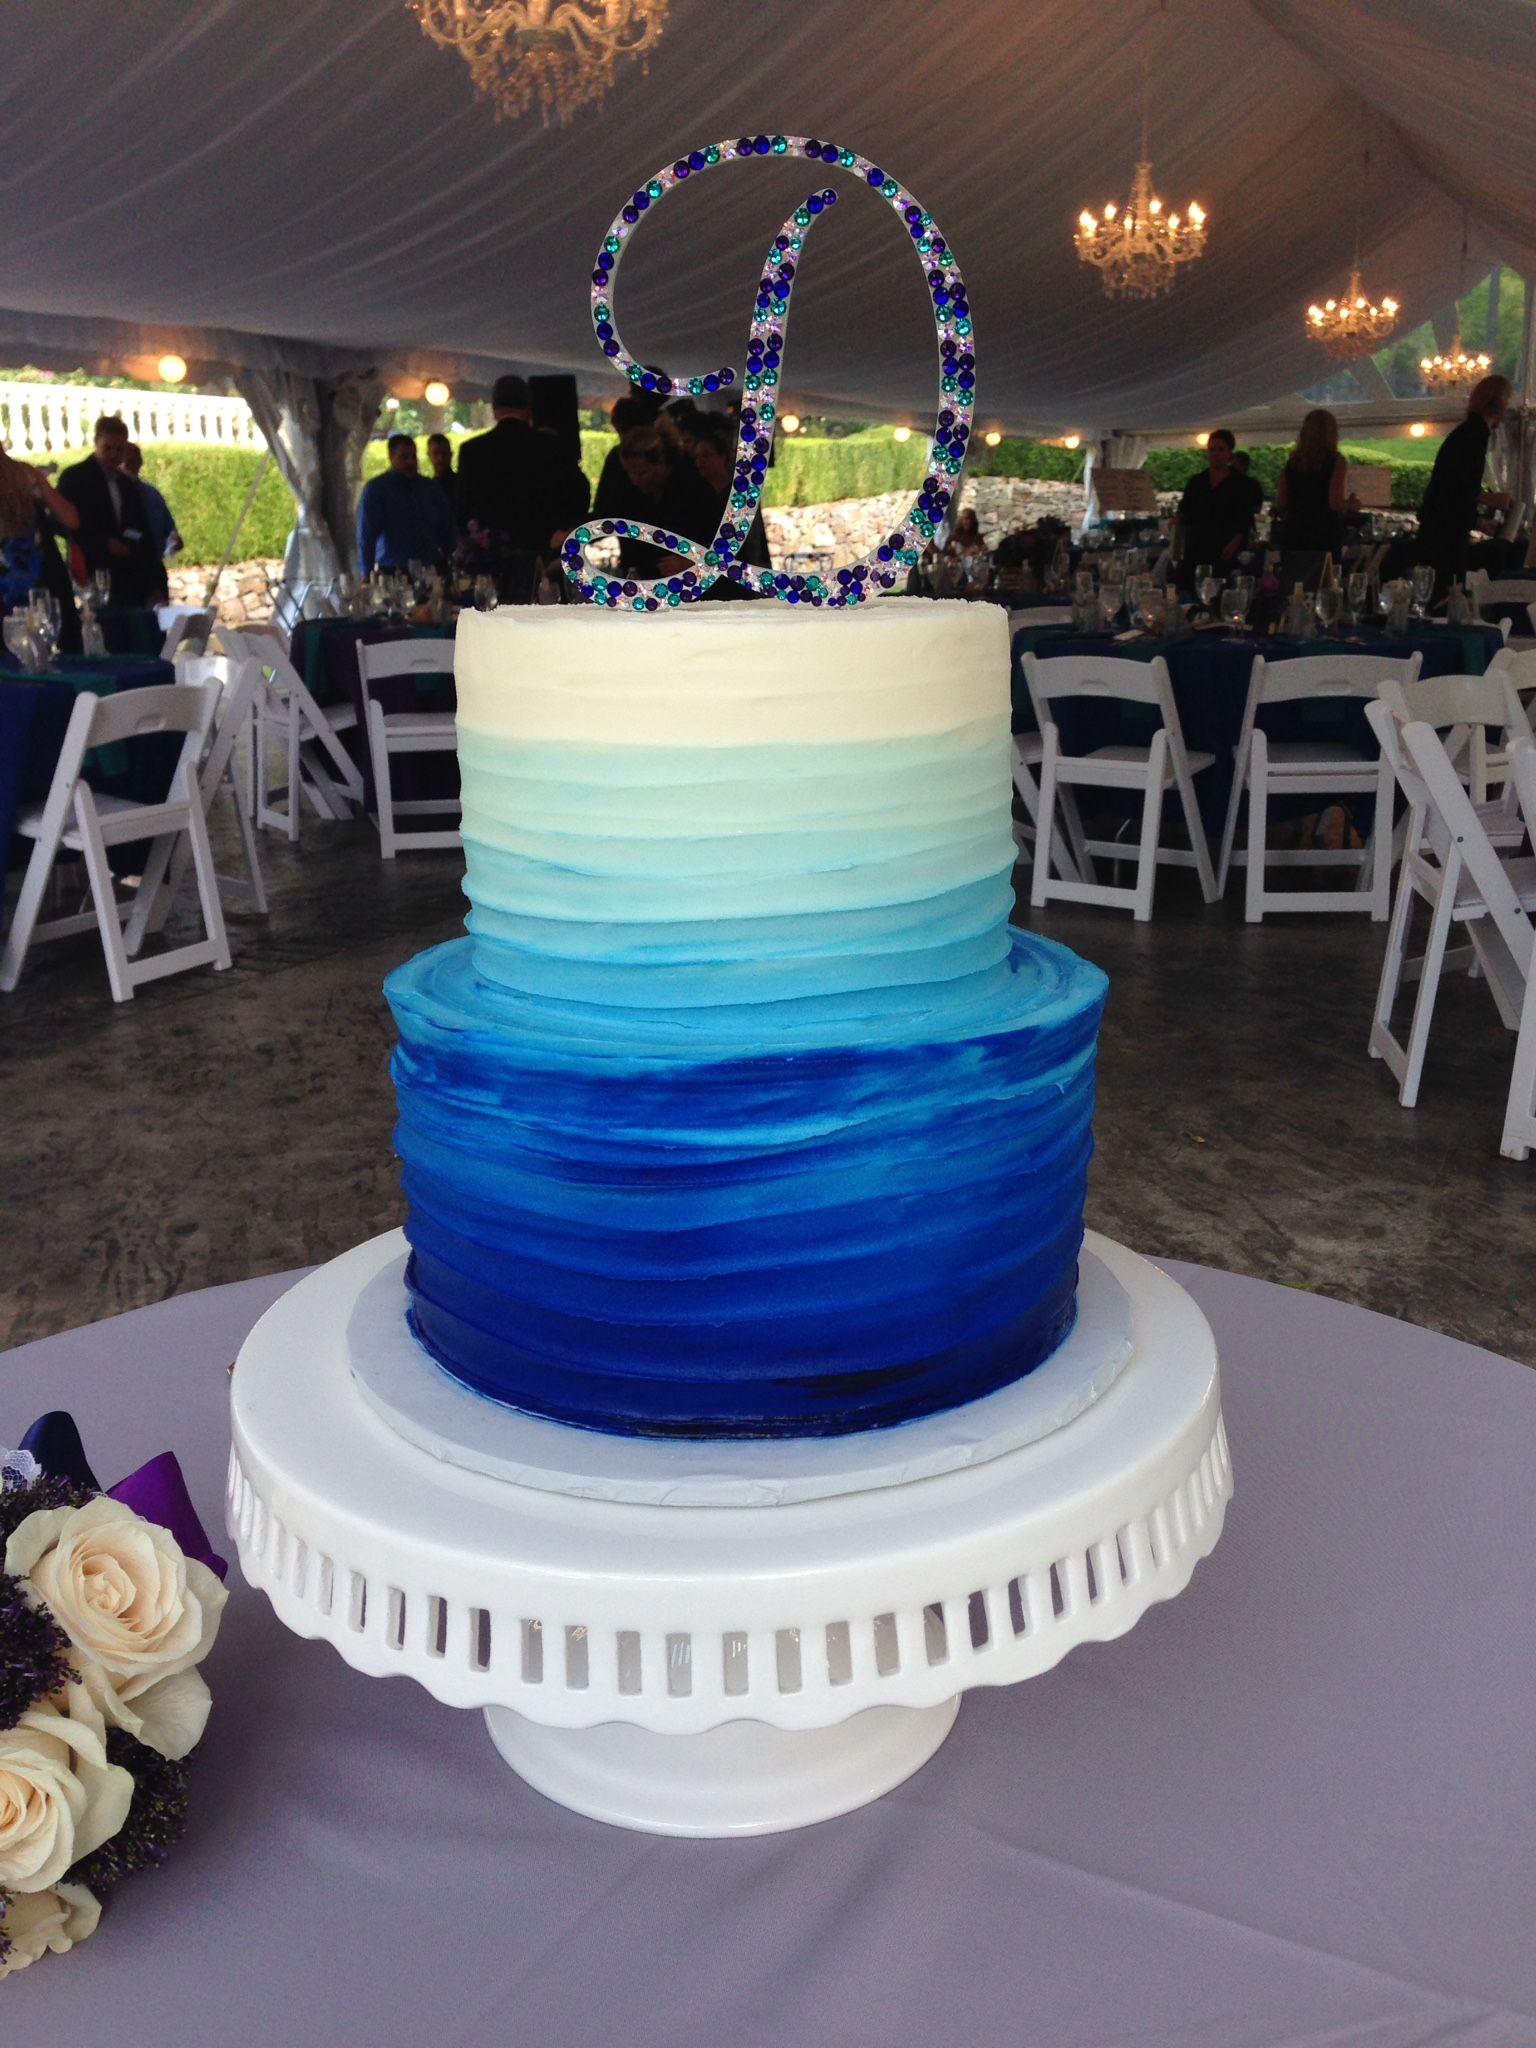 Textured Buttercream Wedding Cake 2 Tier Blue Ombre